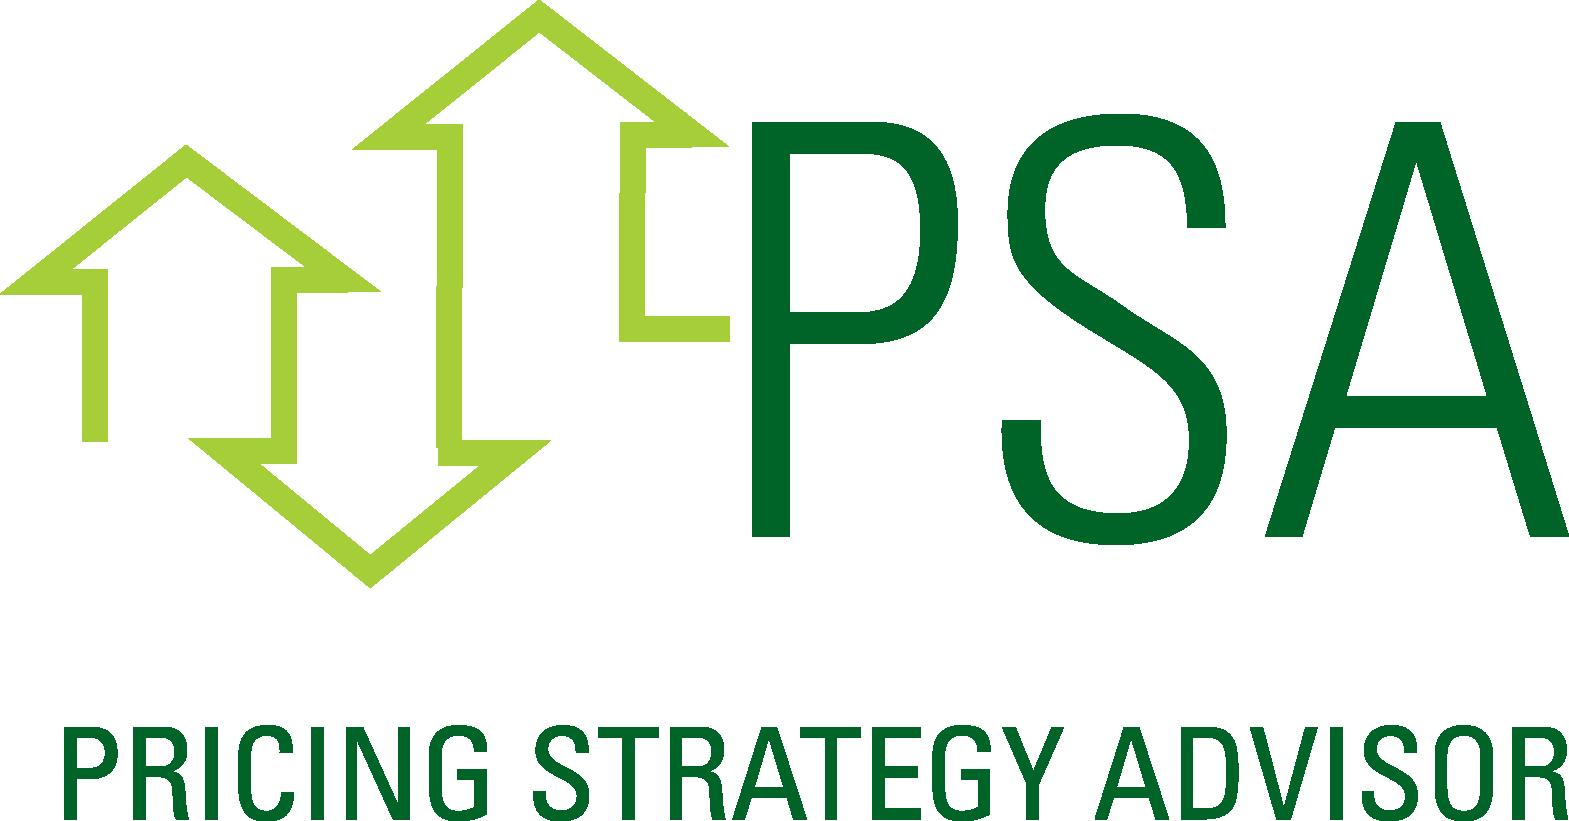 PSA - Pricing Strategy Advisor